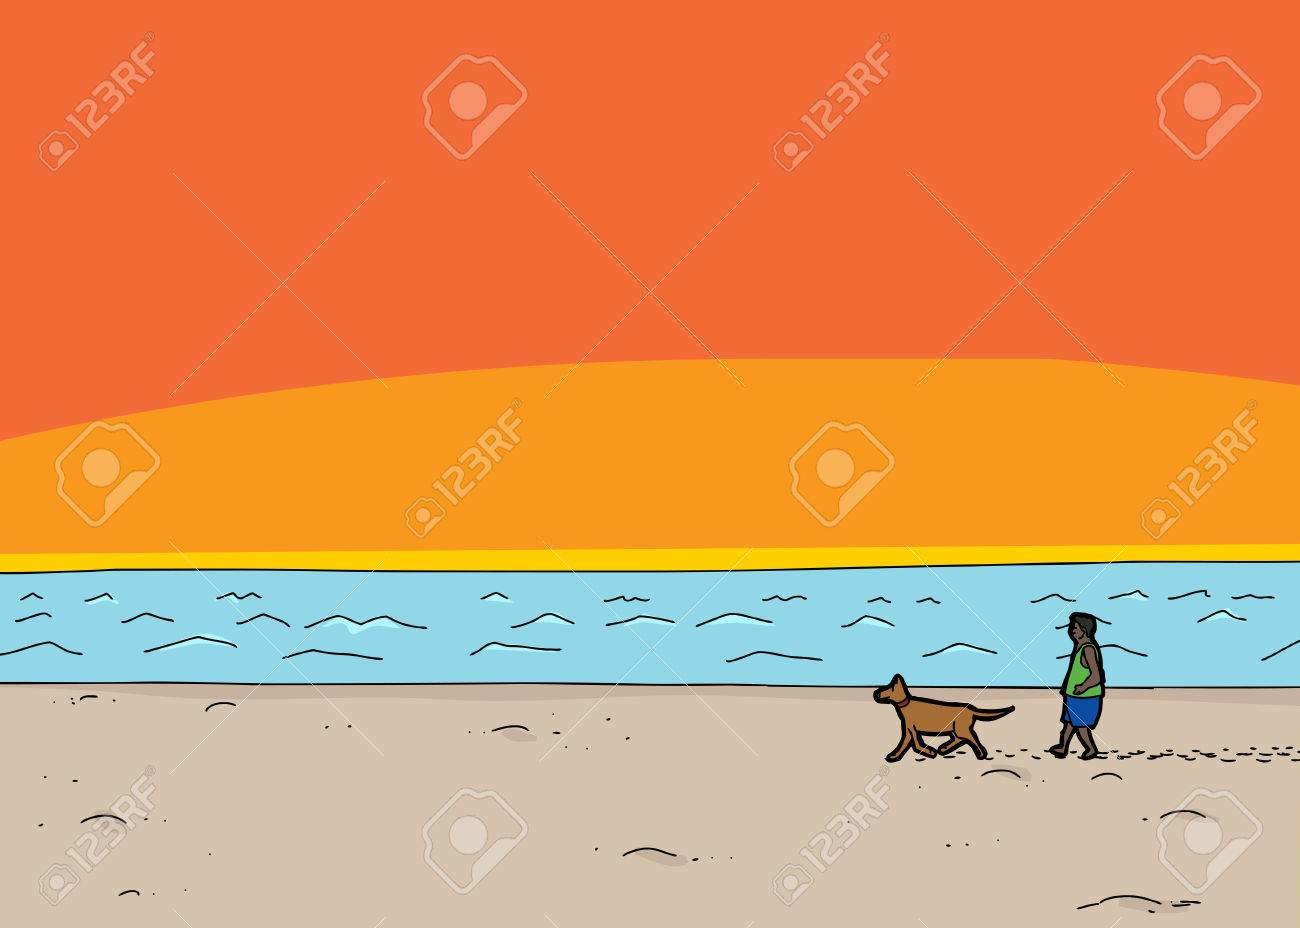 Cartoon scene of man walking dog on beach at sunset cartoon scene of man walking dog on beach at sunset 40993119 voltagebd Gallery